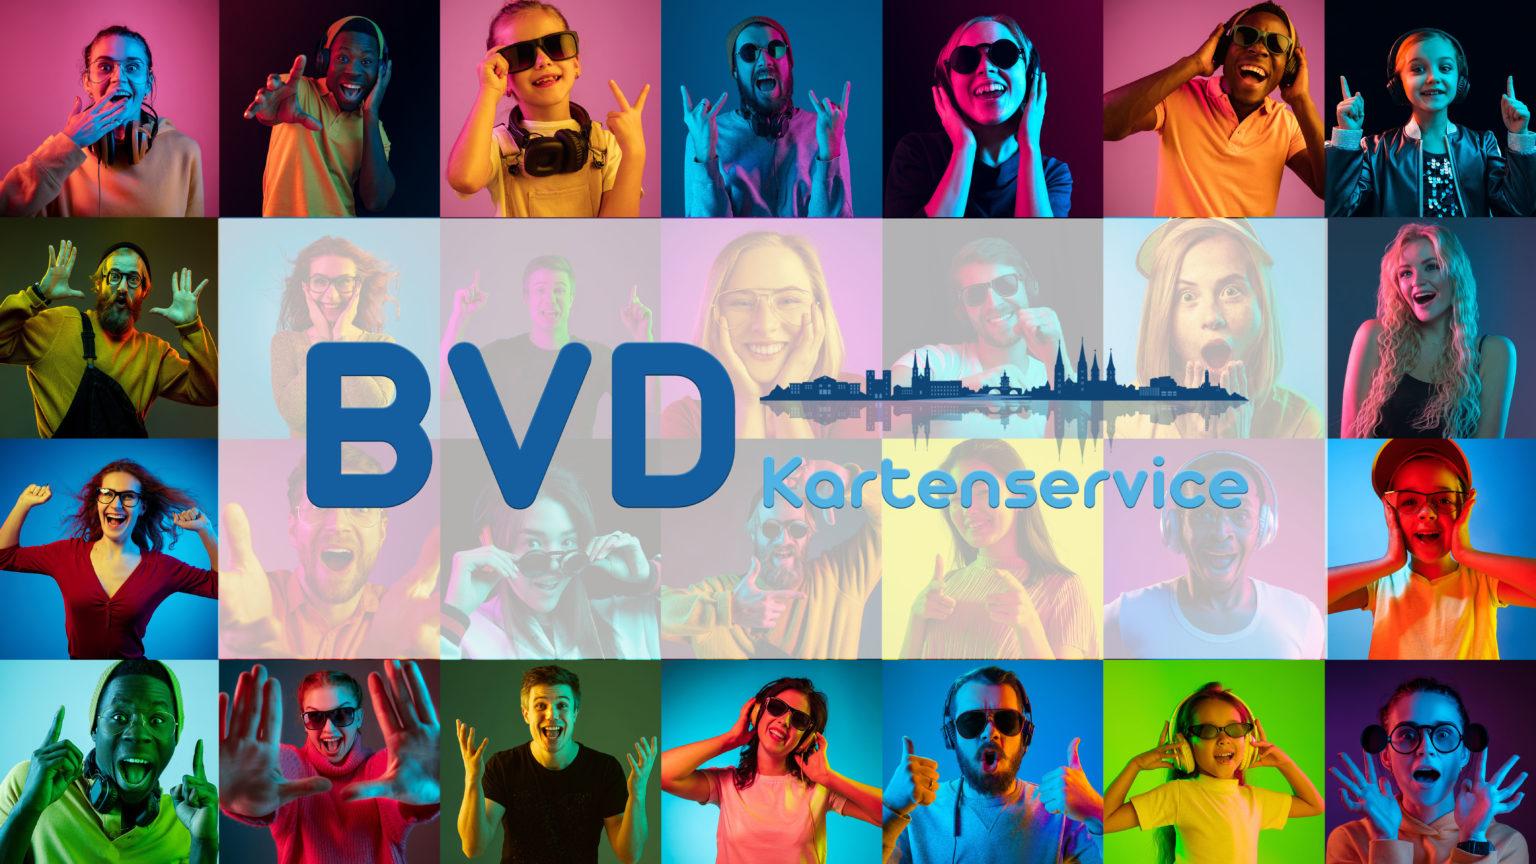 BVD Kartenservice